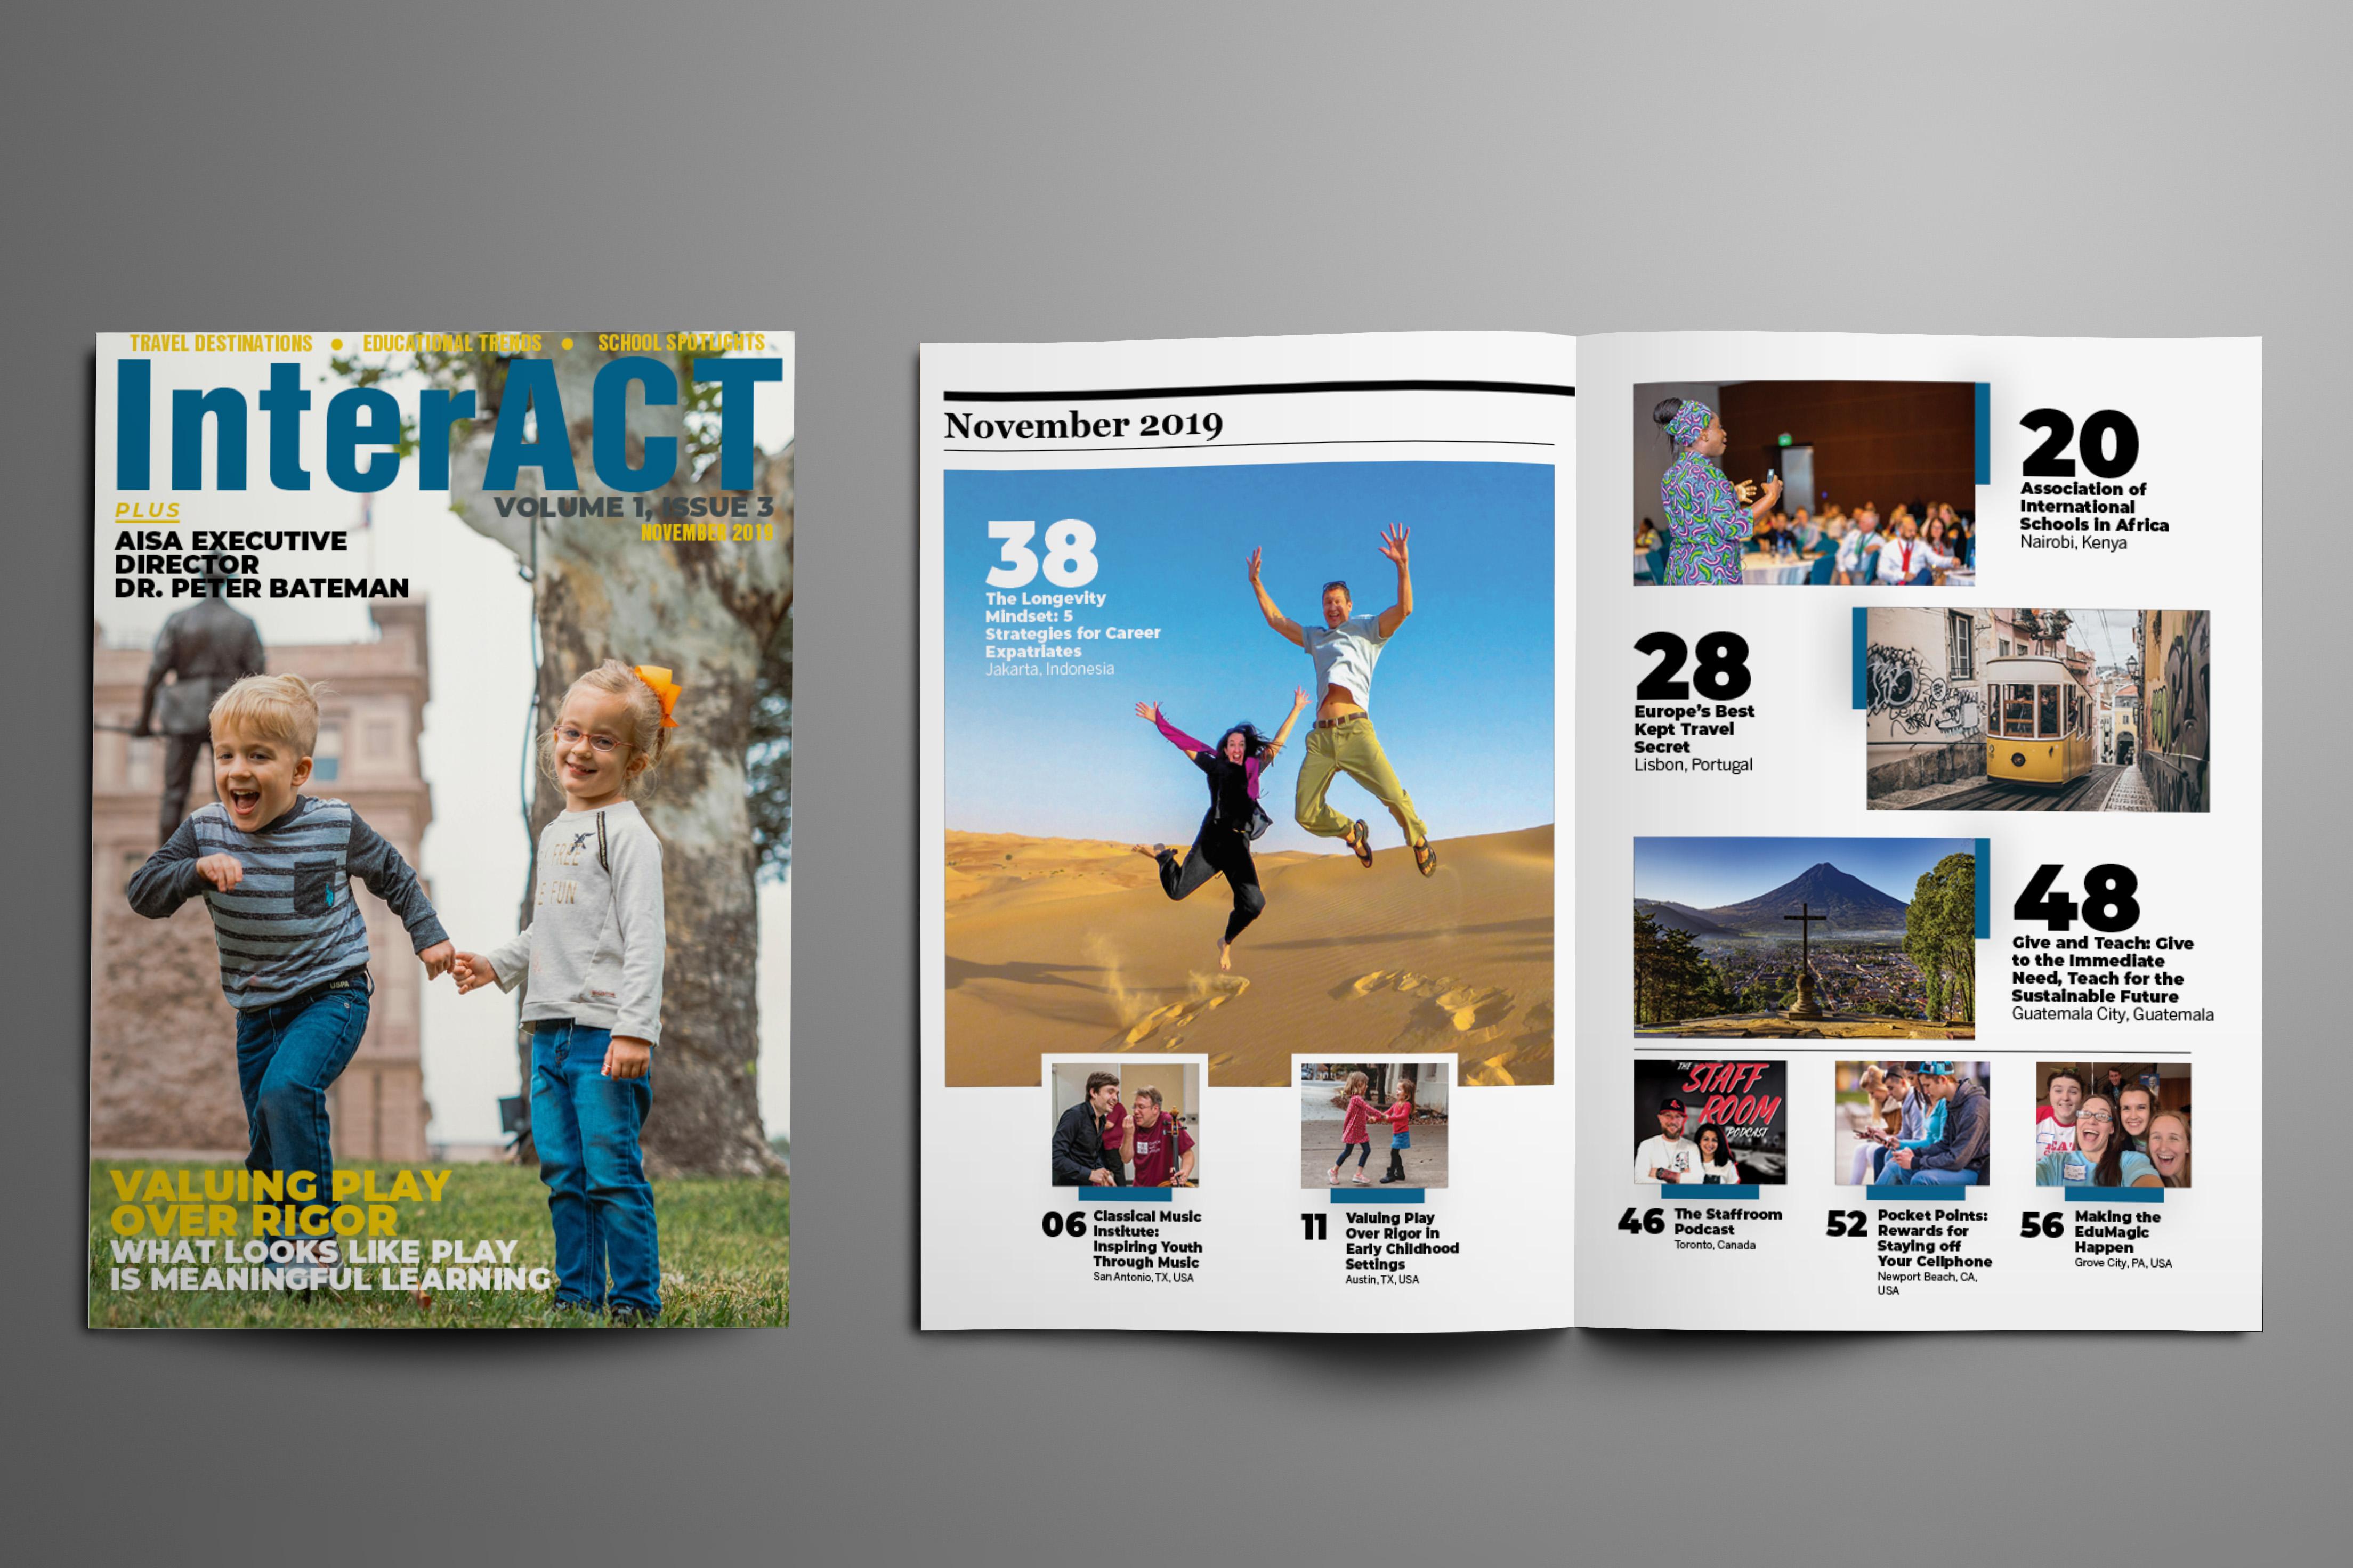 InterACT Magazine Volume 1 Issue 3